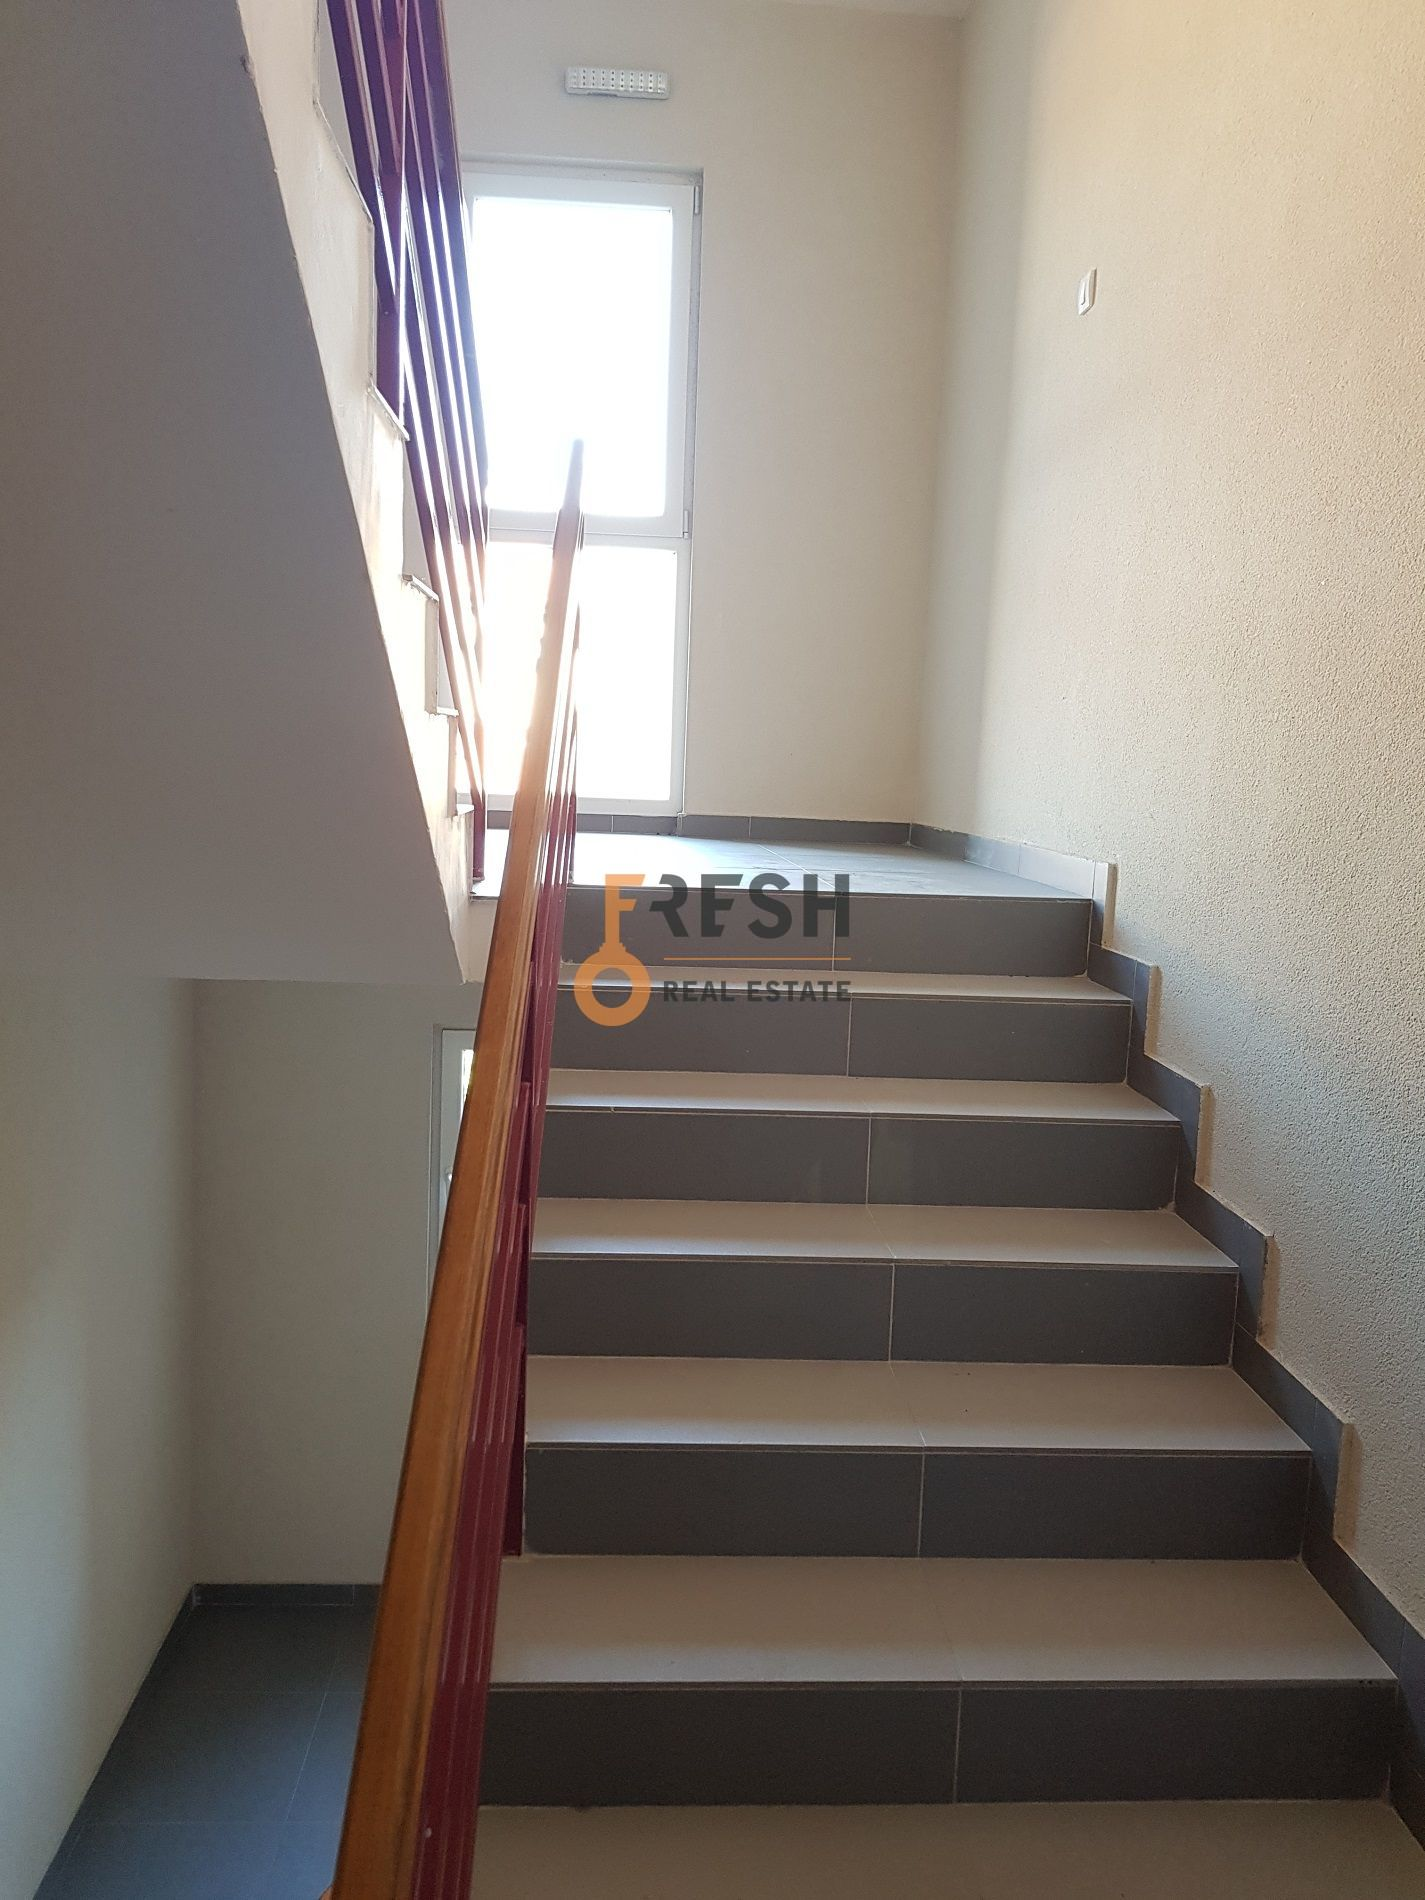 Jednosoban stan 45 m2, Centar, Pljevlja, Prodaja - 4